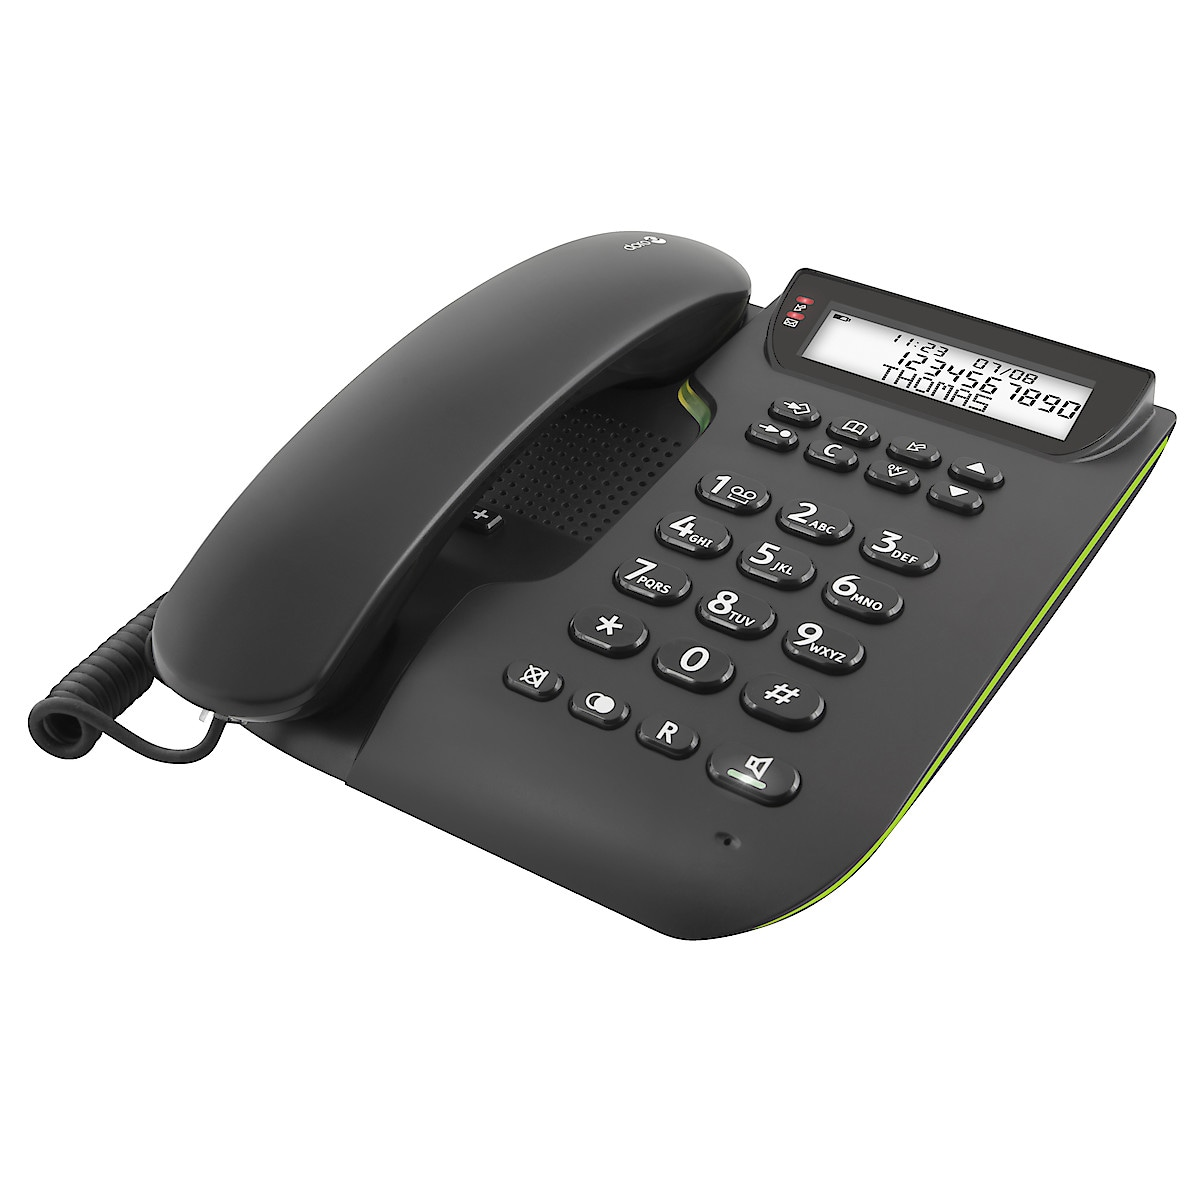 Telefon Doro Comfort 3000